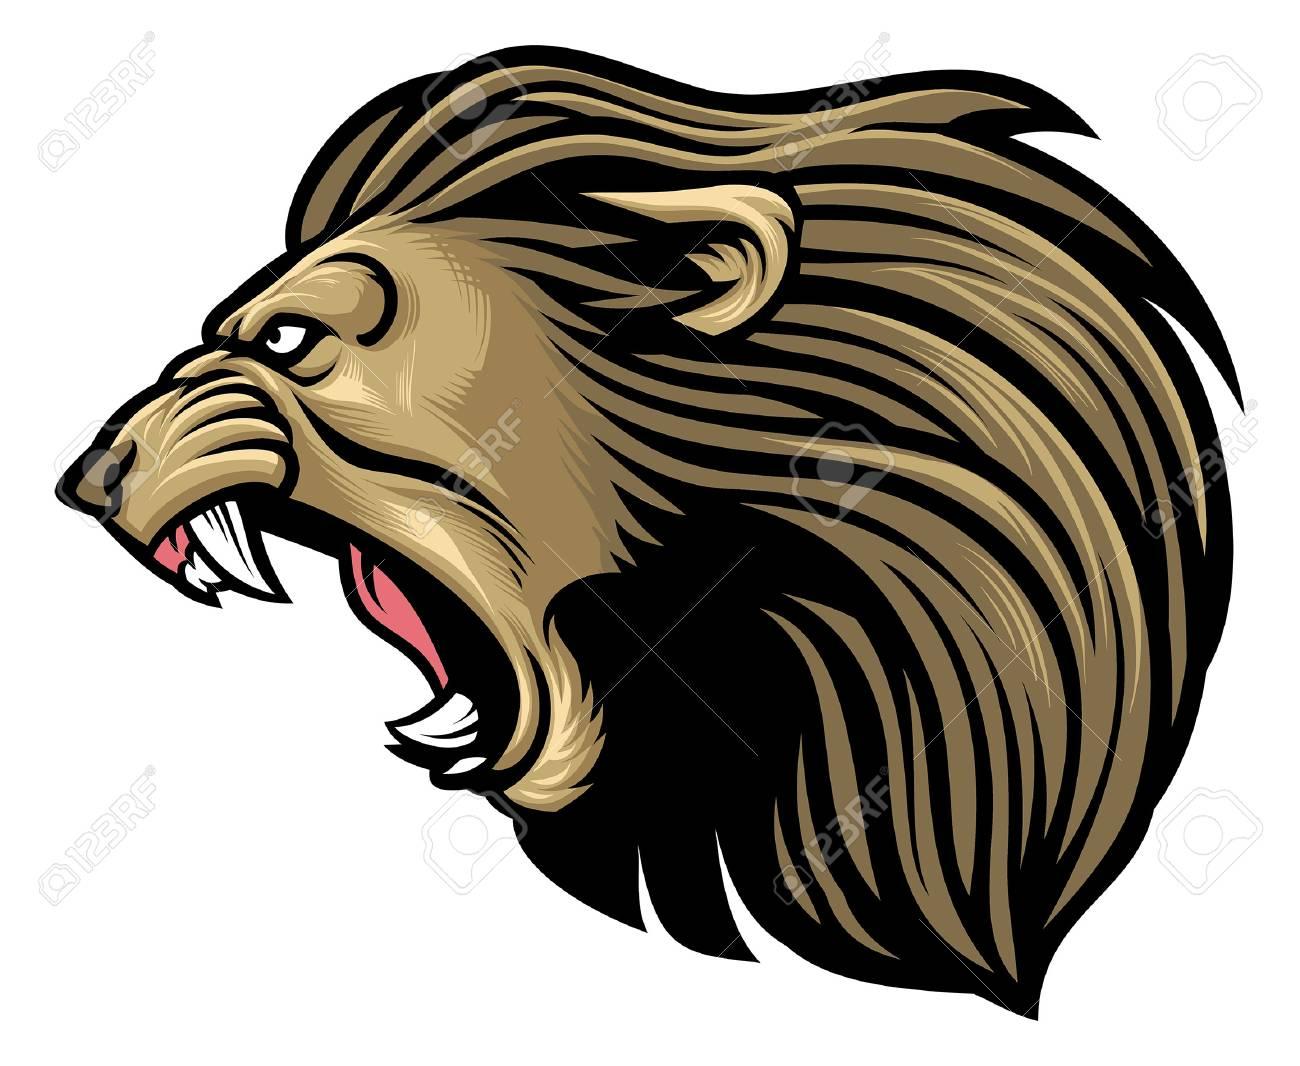 angry lion mascot - 122196748